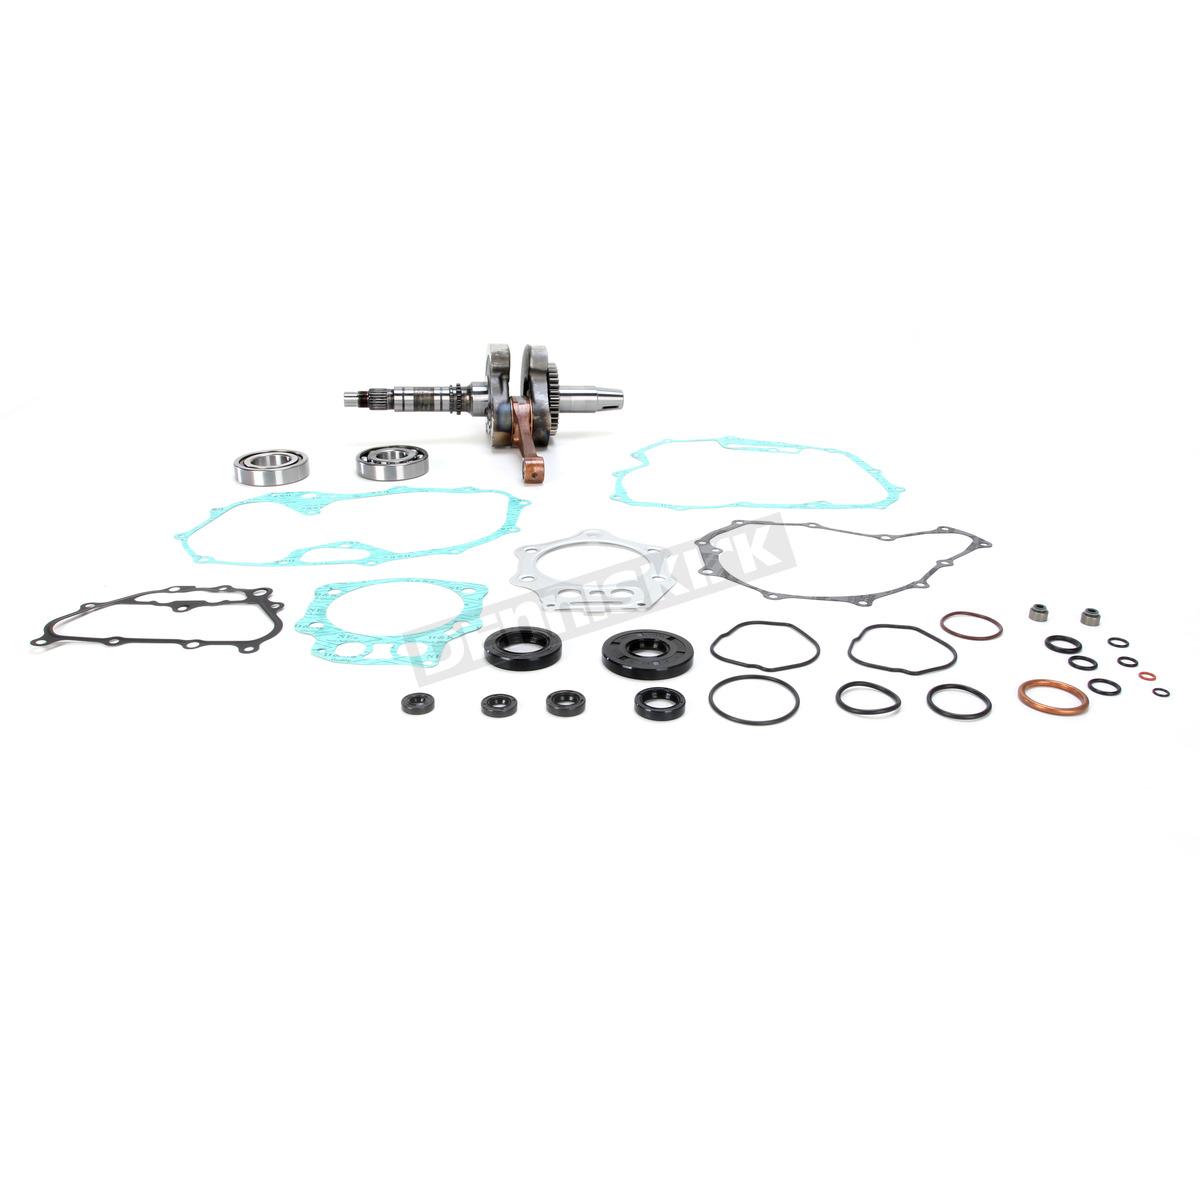 Hot Rods Heavy Duty Crankshaft Bottom End Kit